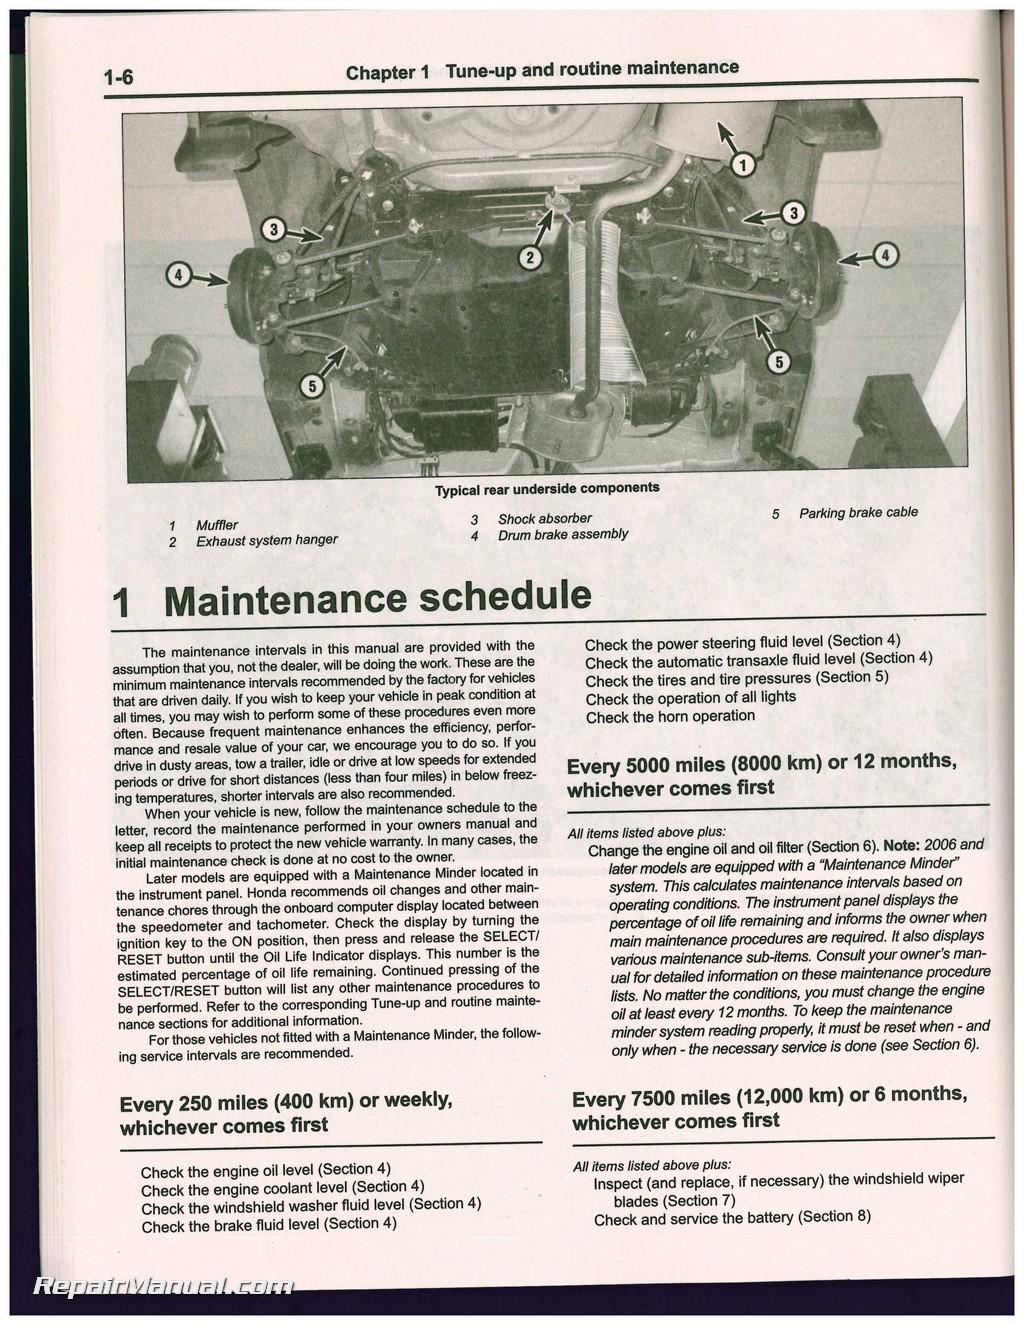 Pilot Steeringwheeltrim S further Img U Ligeb moreover Img Hogeb likewise E furthermore Element Driv Sid Arm Stor. on 2003 honda accord maintenance